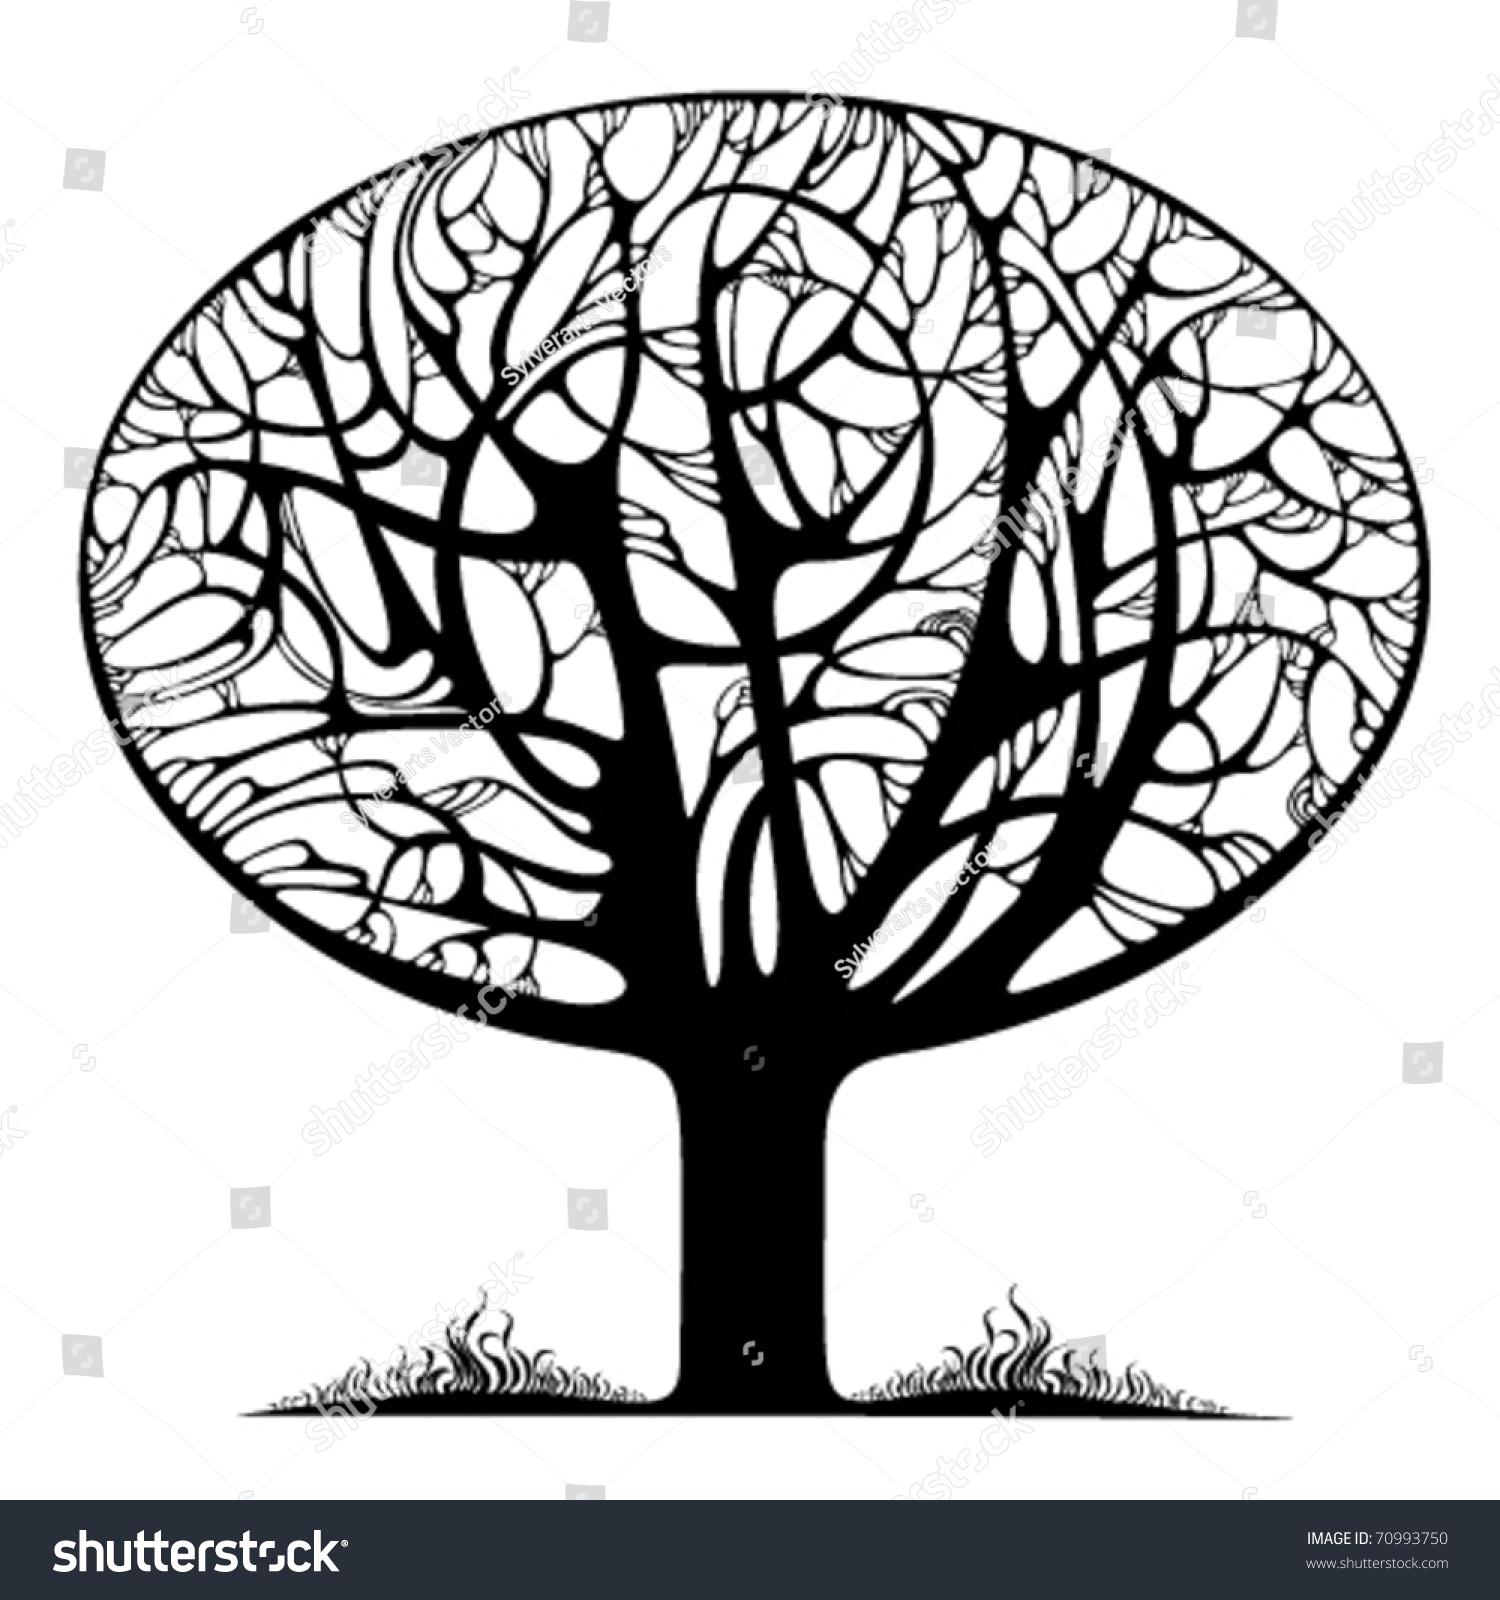 shrub graphic symbols diagram elk anatomy stylized tree icon curly branches stock vector